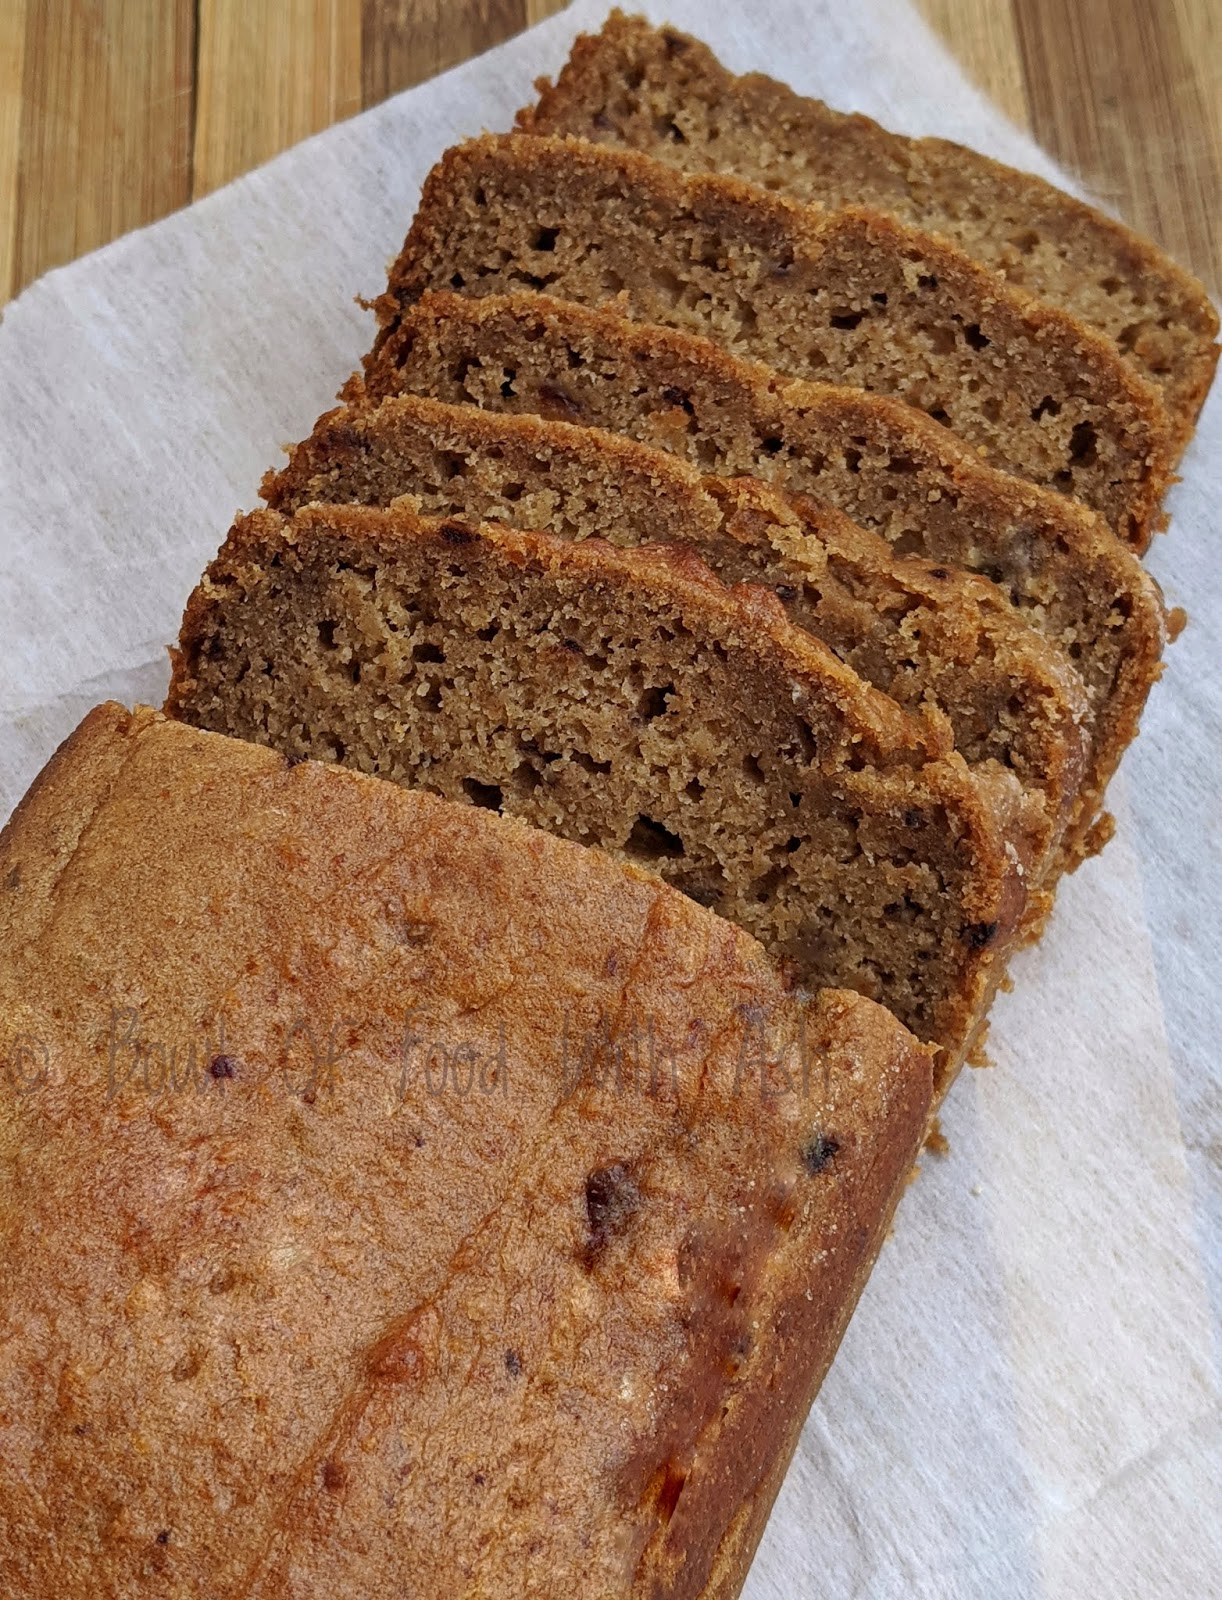 Eggless Sugarless Whole Wheat Banana and Dates Cake Recipe | How To Make Eggless Sugarless Banana and Dates cake